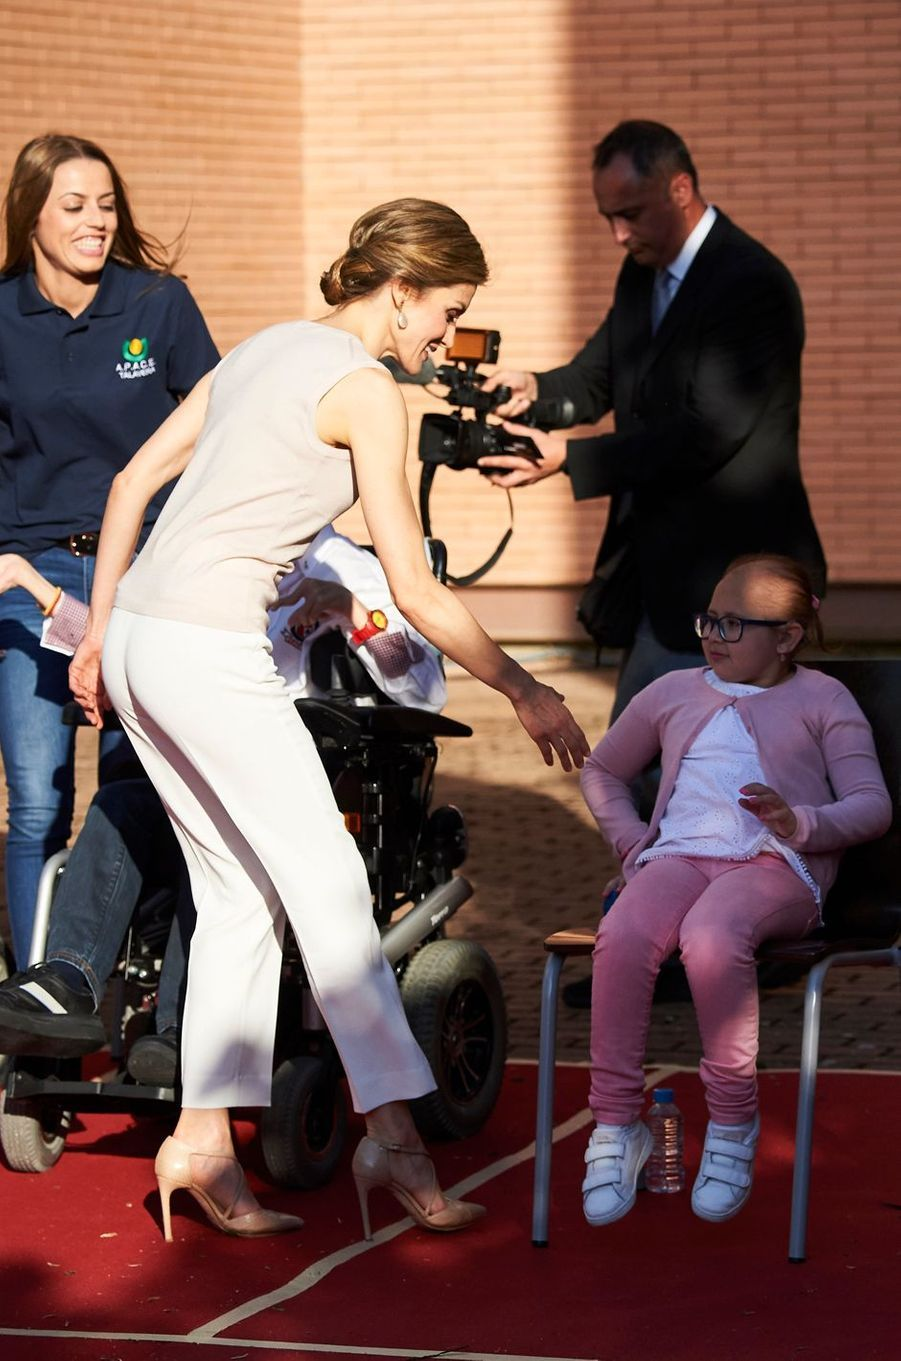 La reine Letizia d'Espagne à Talavera de la Reina, le 18 mai 2016